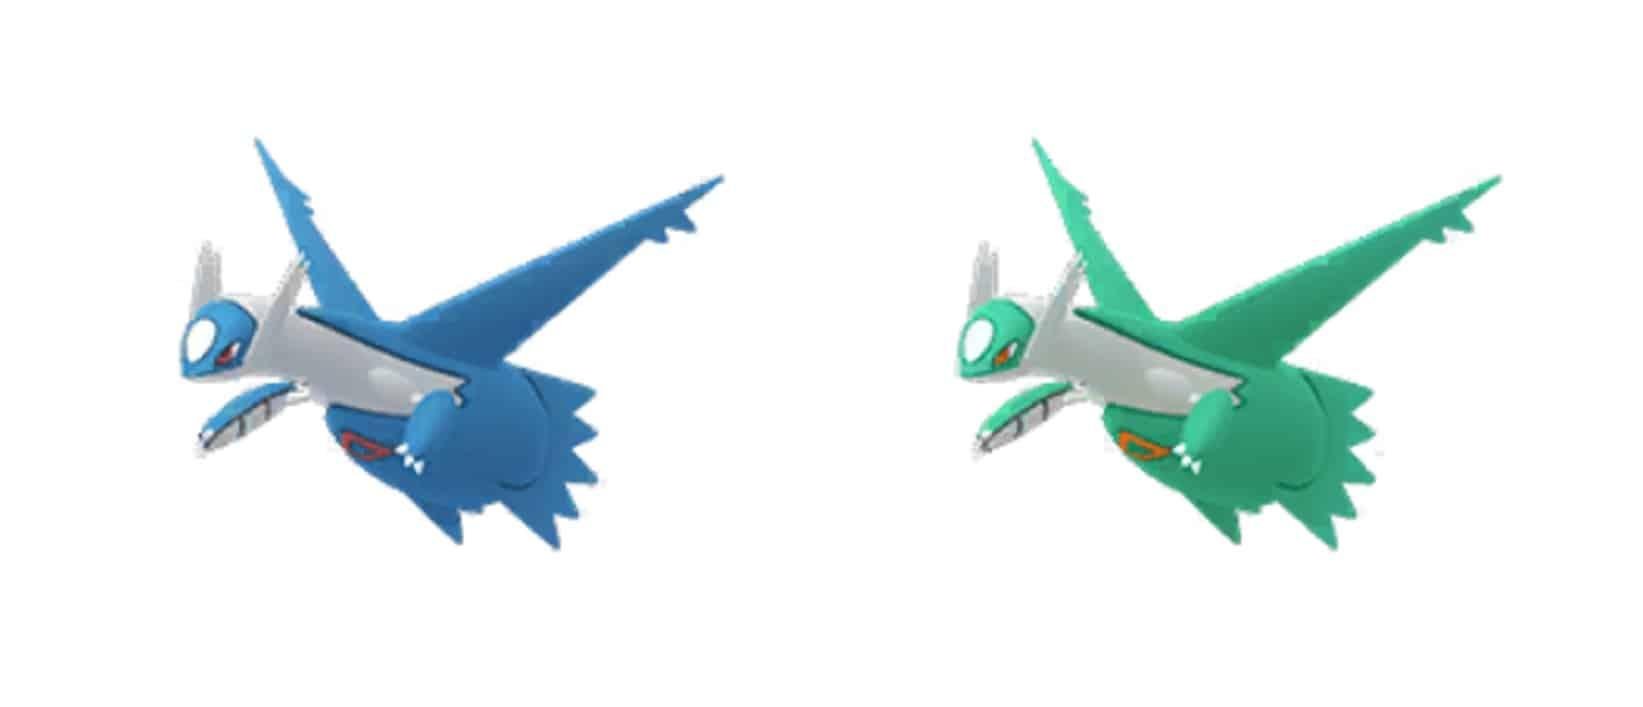 pokemon go seeings new shiny latios return to raids